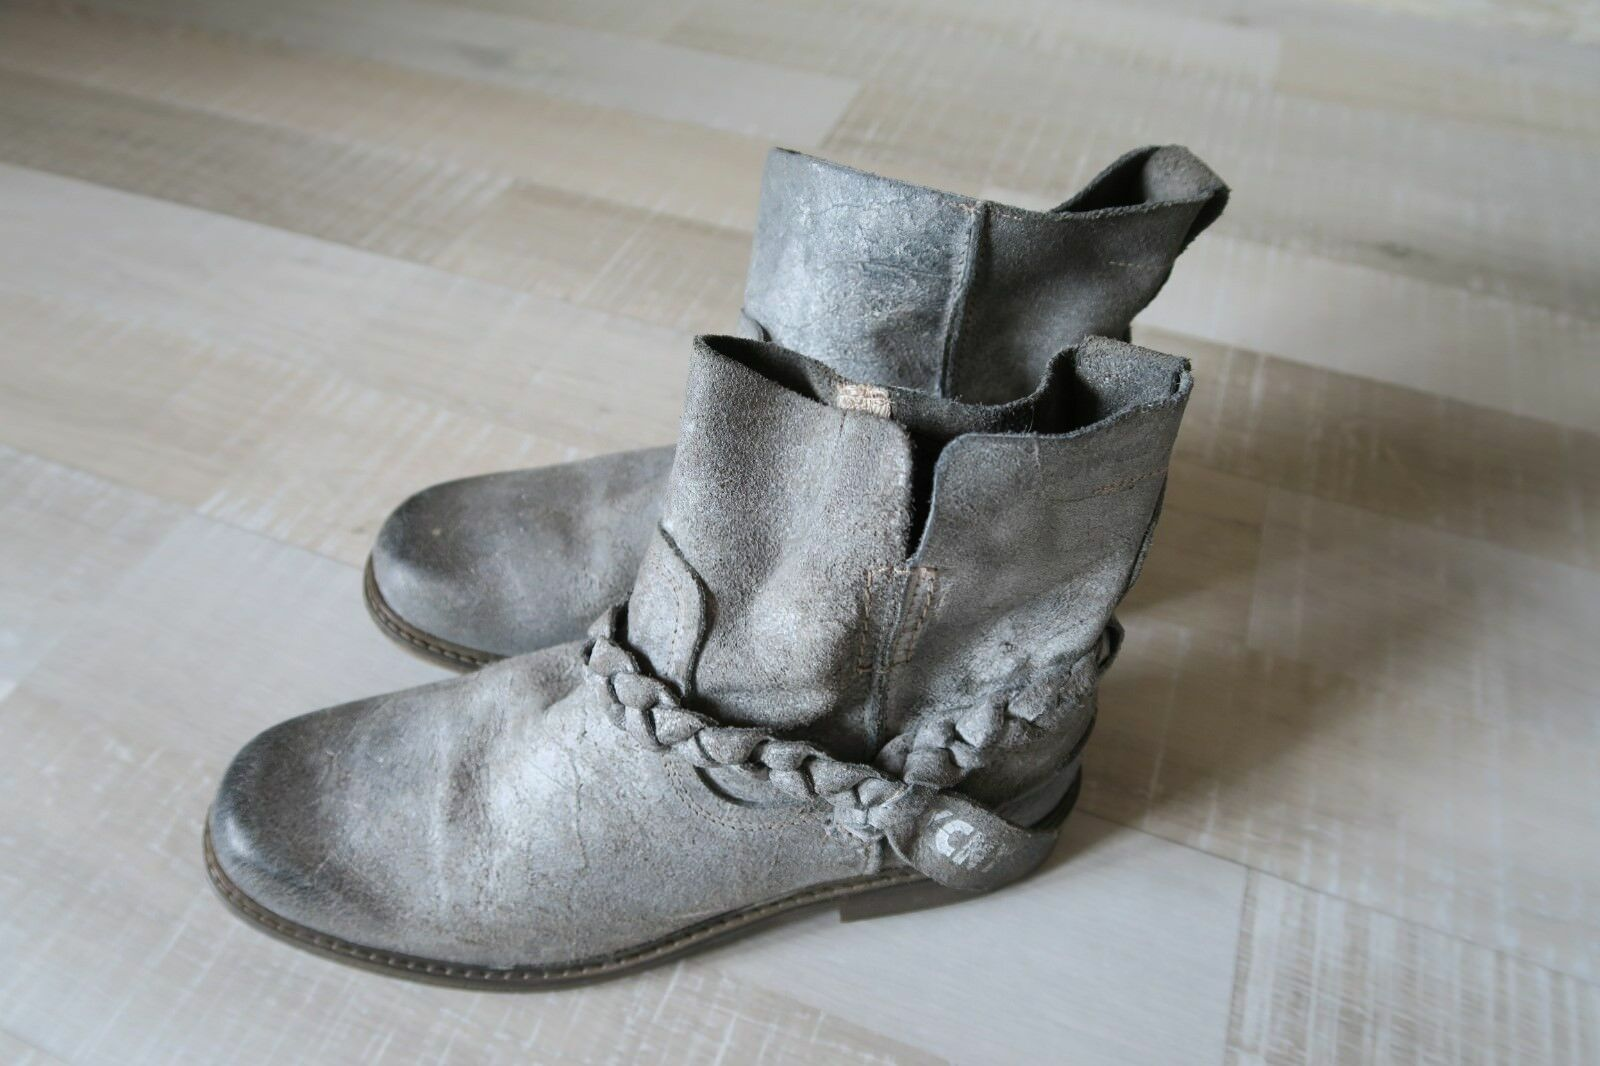 Nata Shoes Portugal Lederstiefelette Stiefelette Lederschuhe High Heels 1454